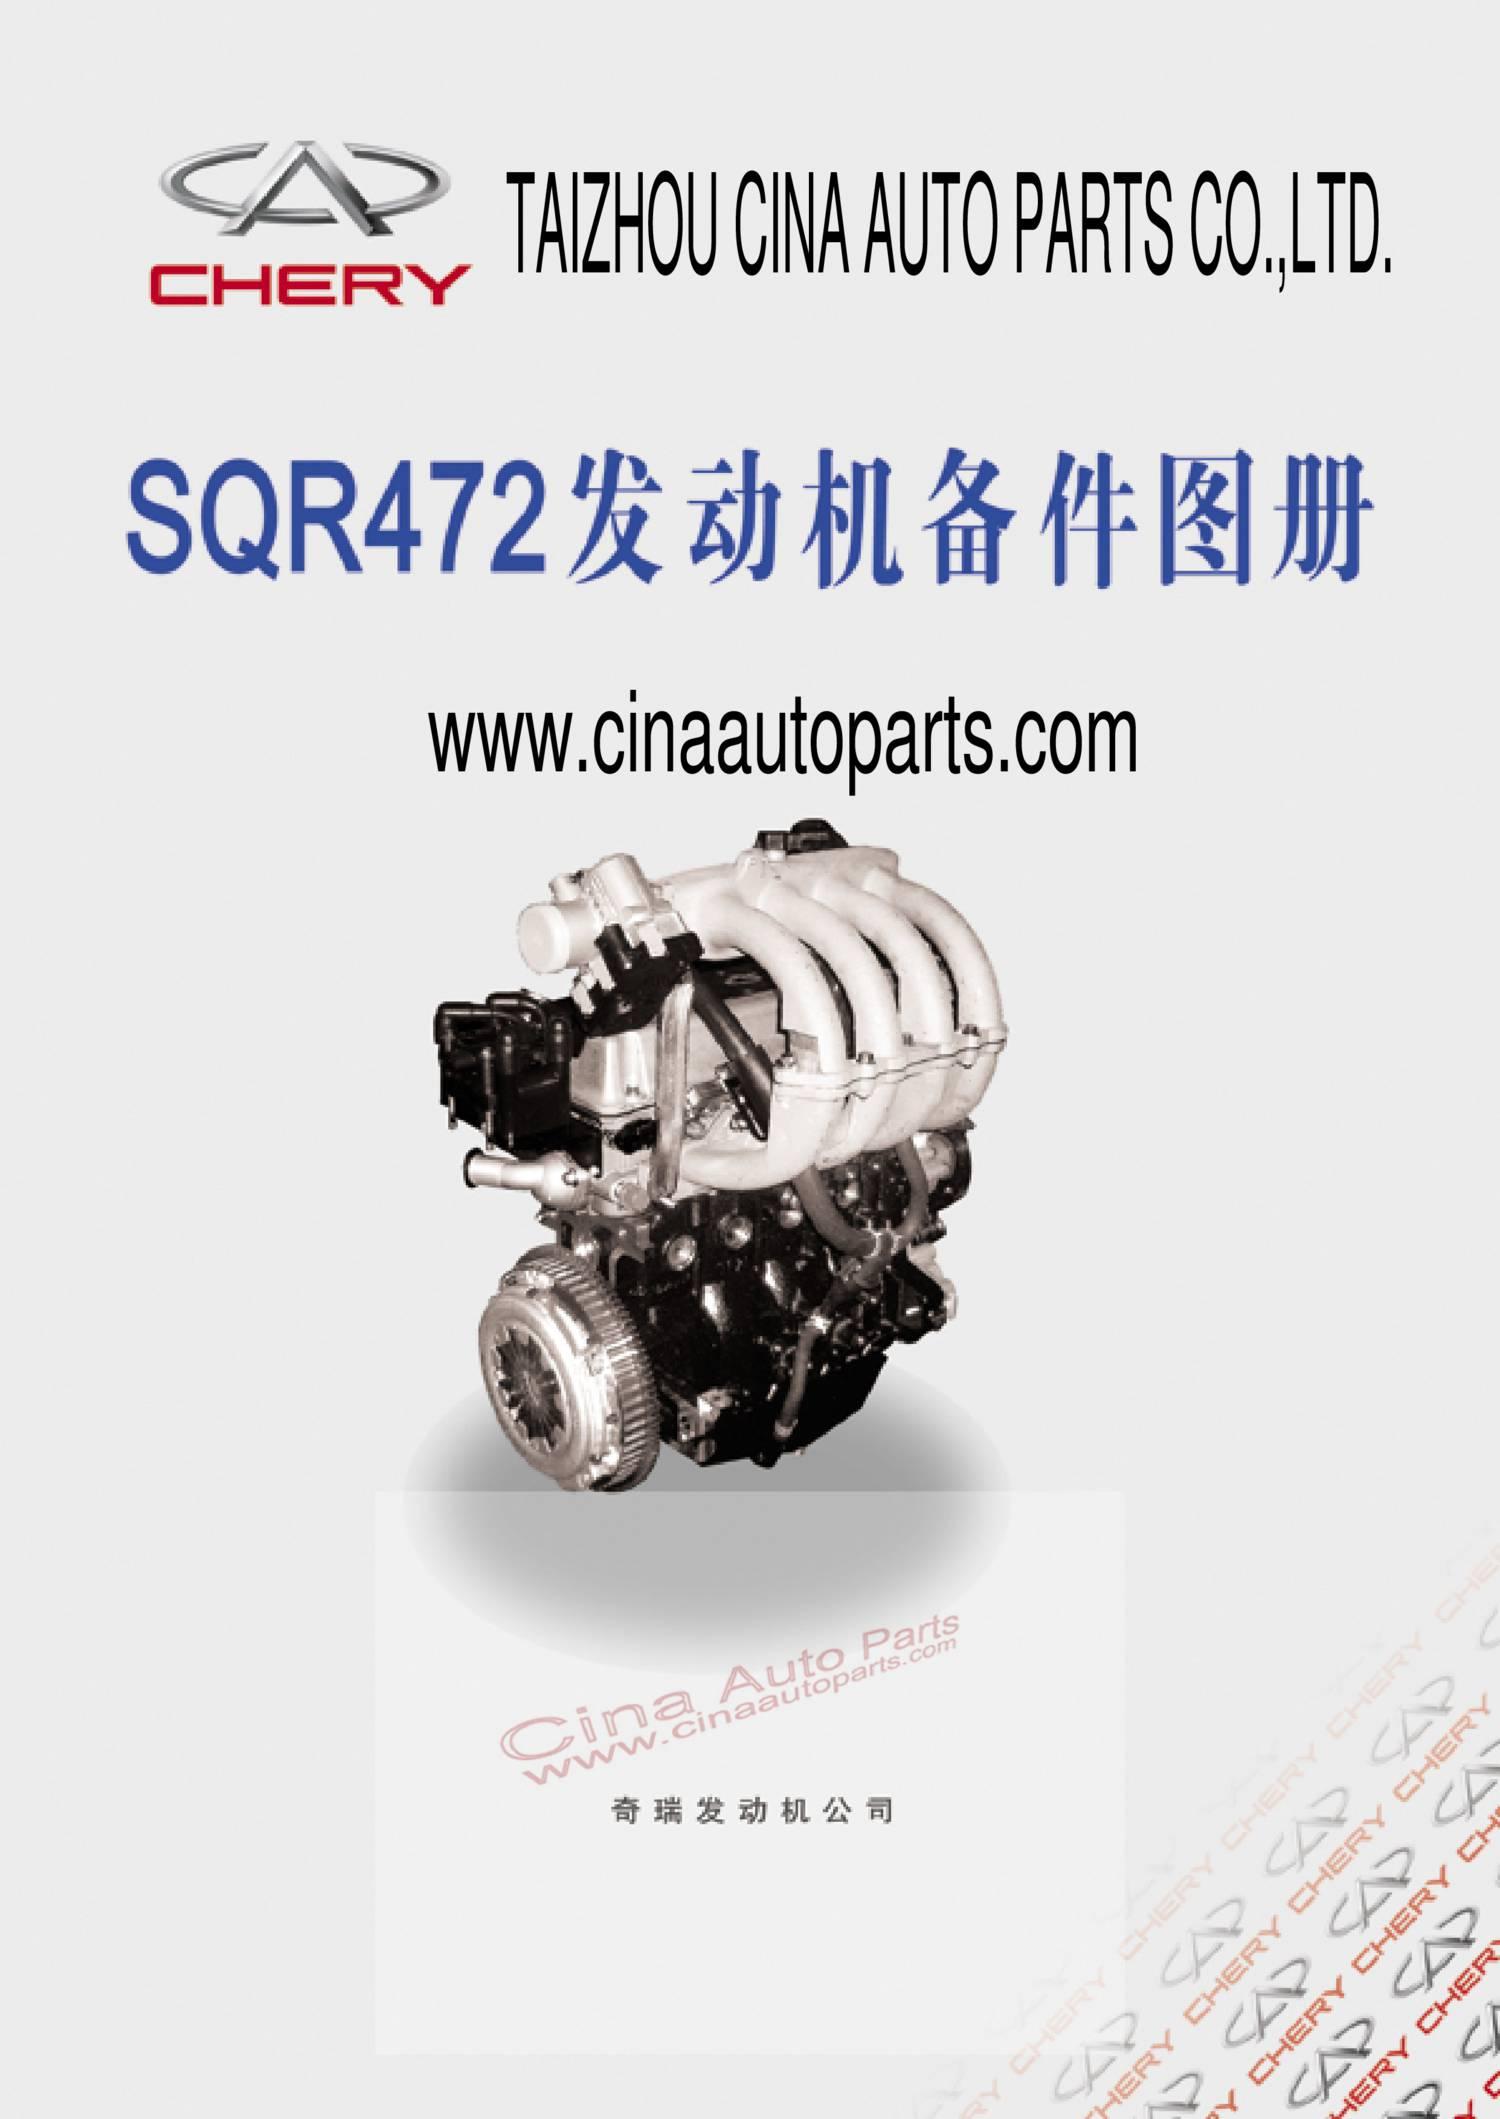 Chery SQR472 engine parts catalog.pdf - DocDroid